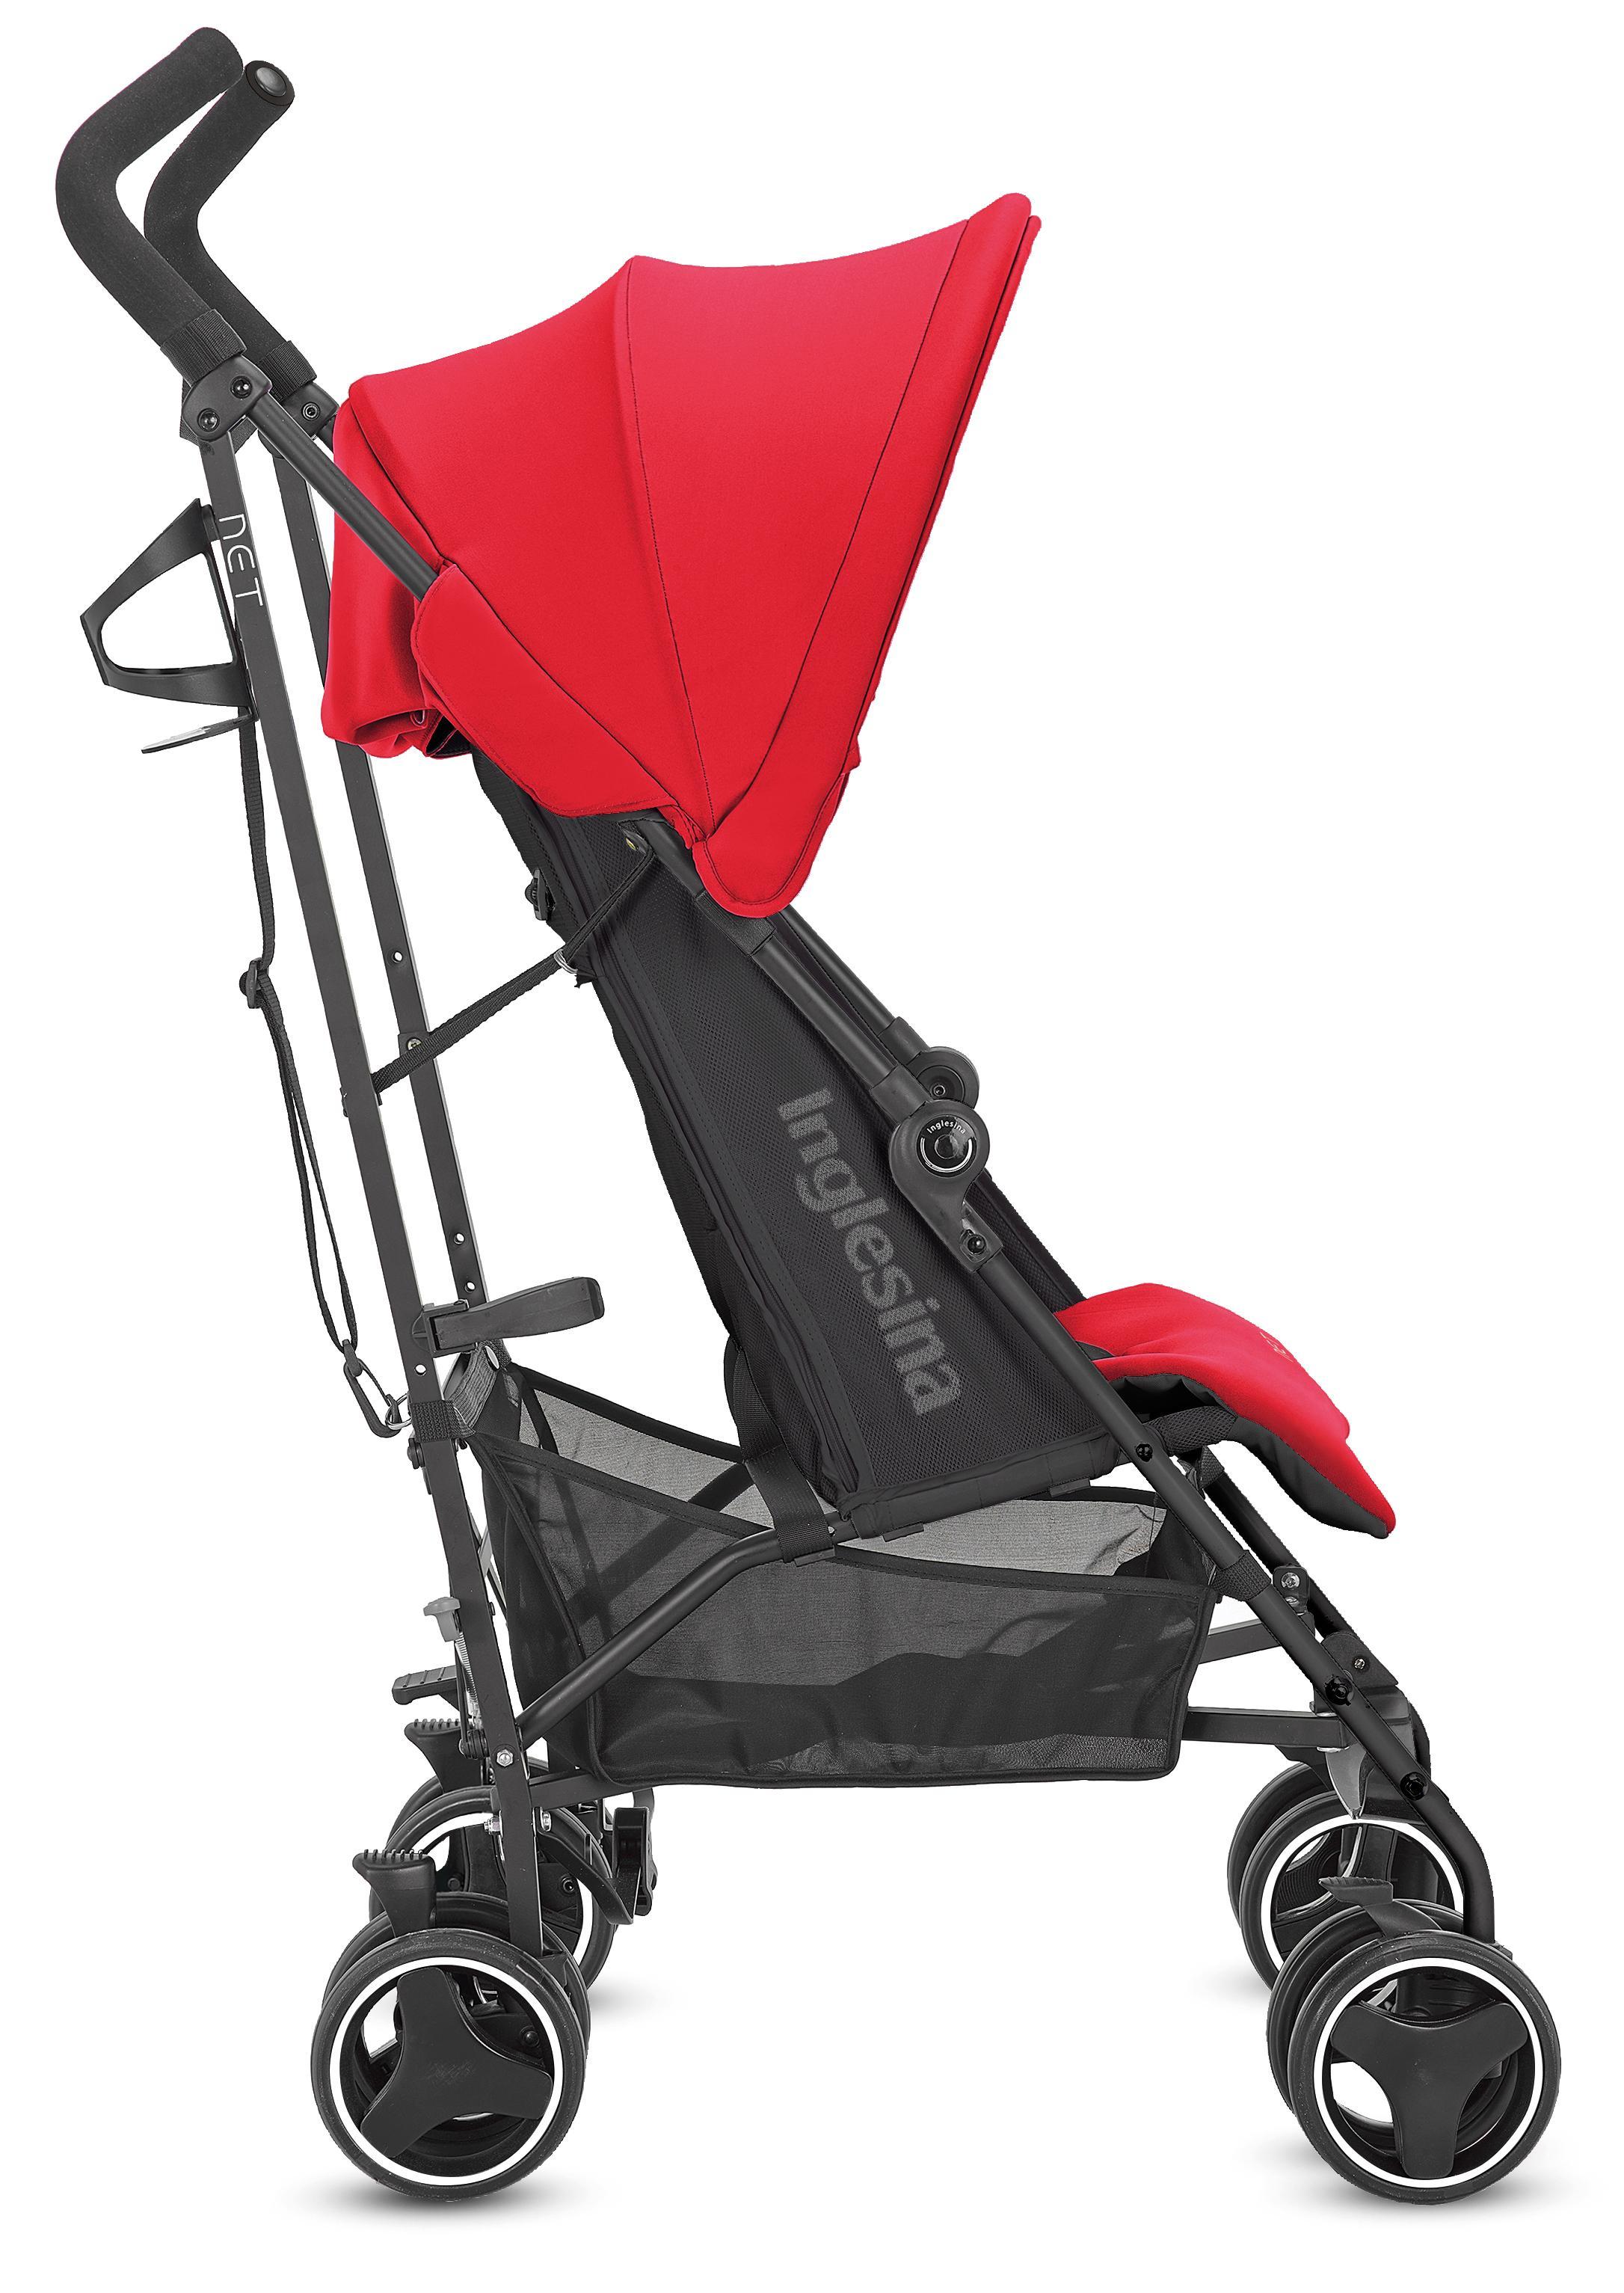 Amazon.com : Inglesina USA Net Stroller, Citronella/Light Green : Baby